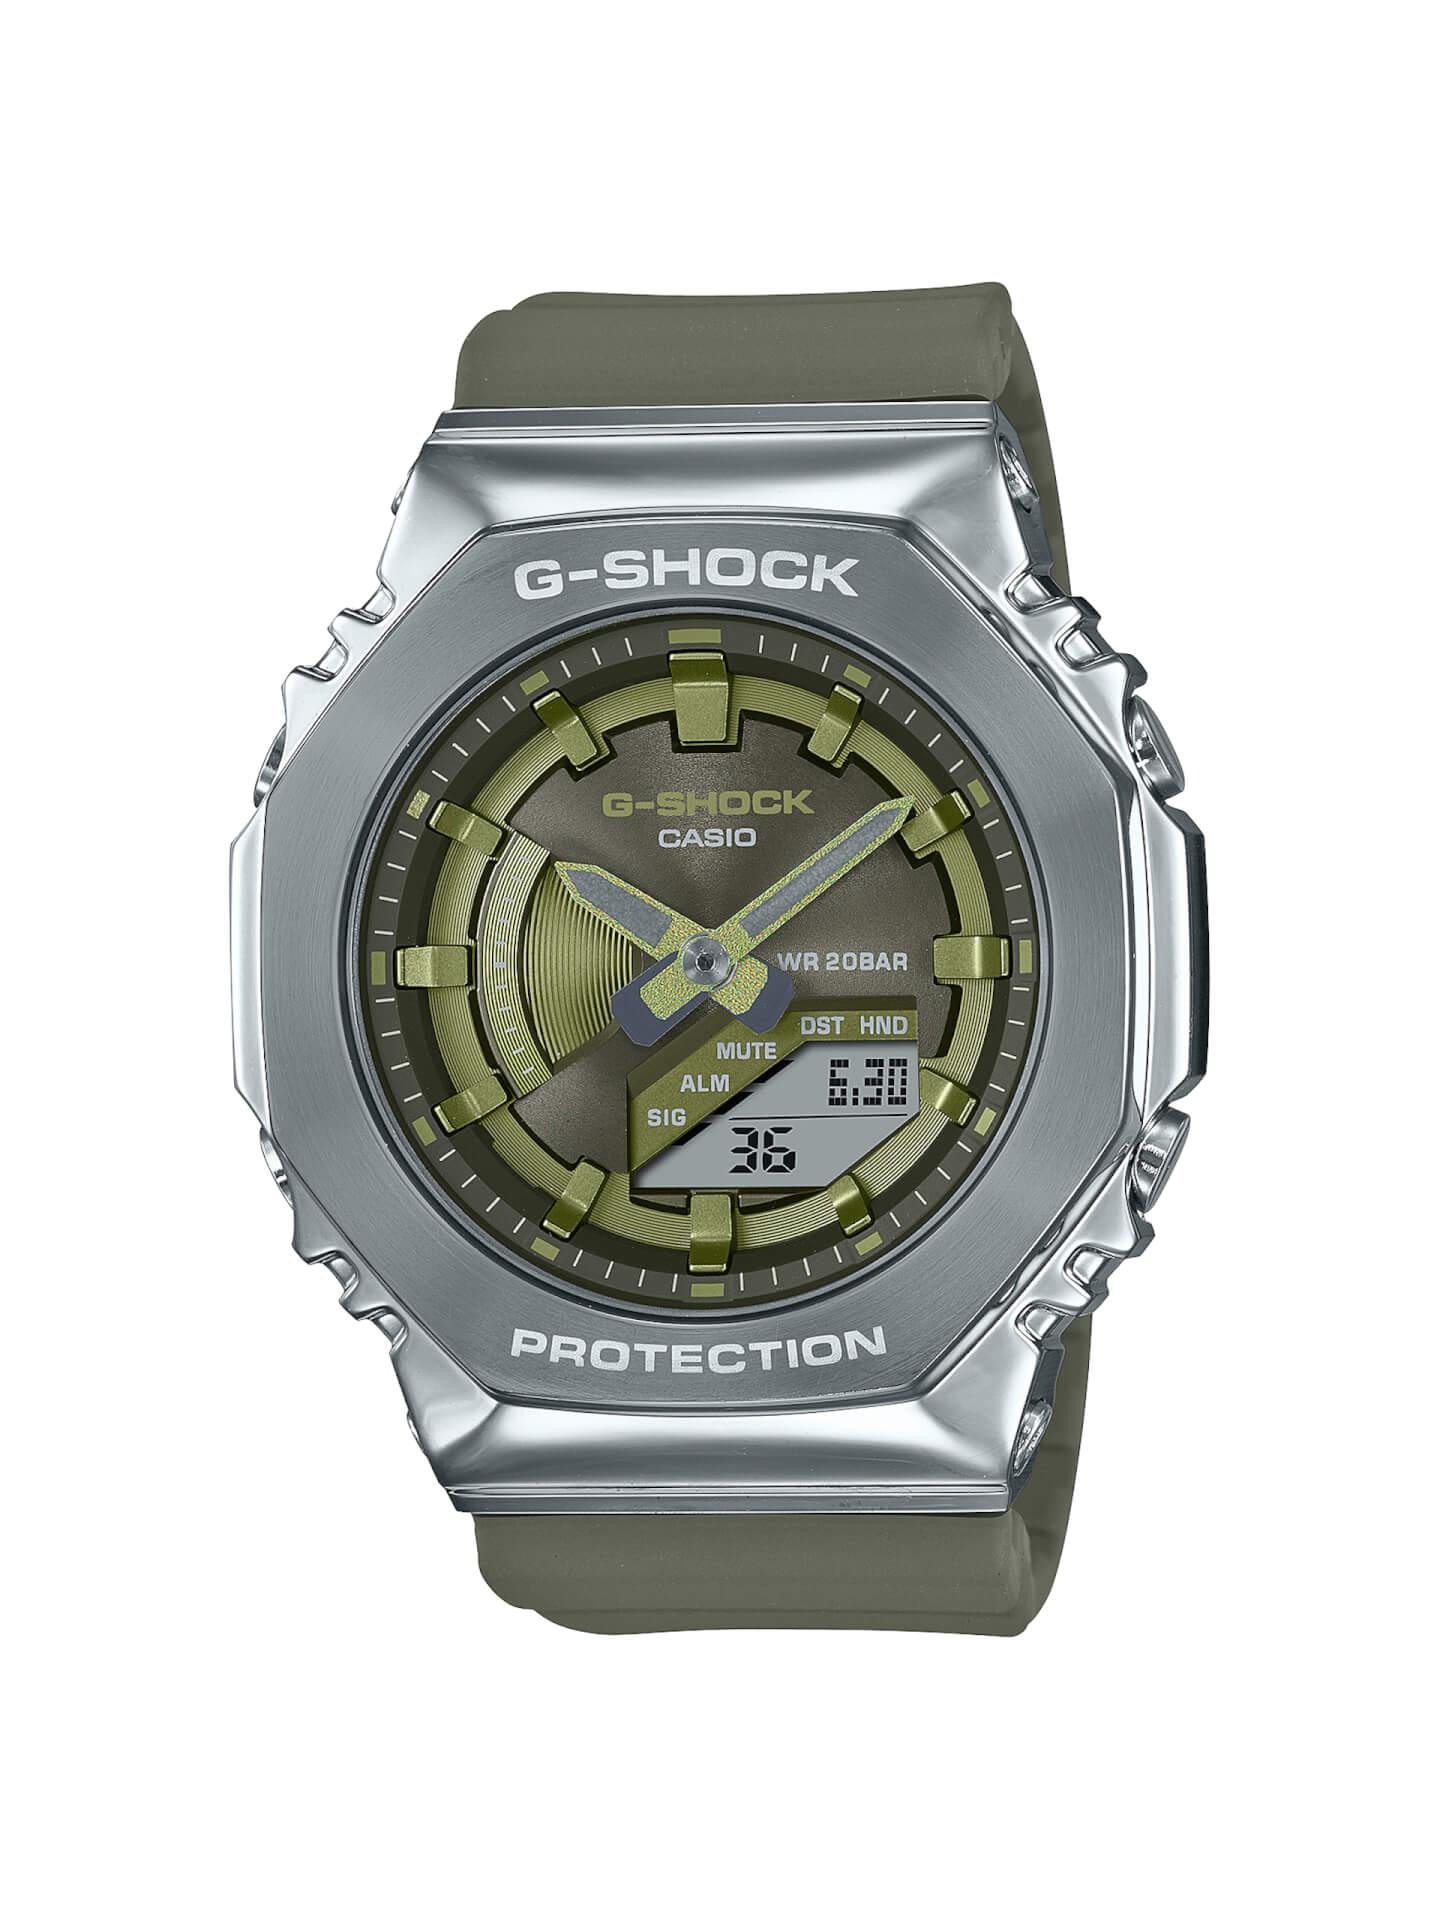 G-SHOCKにメタルベゼルを採用した新モデル2種が登場!『GM-2100』&『GM-S2100』が発売決定 tech210715_gshock_metal_13